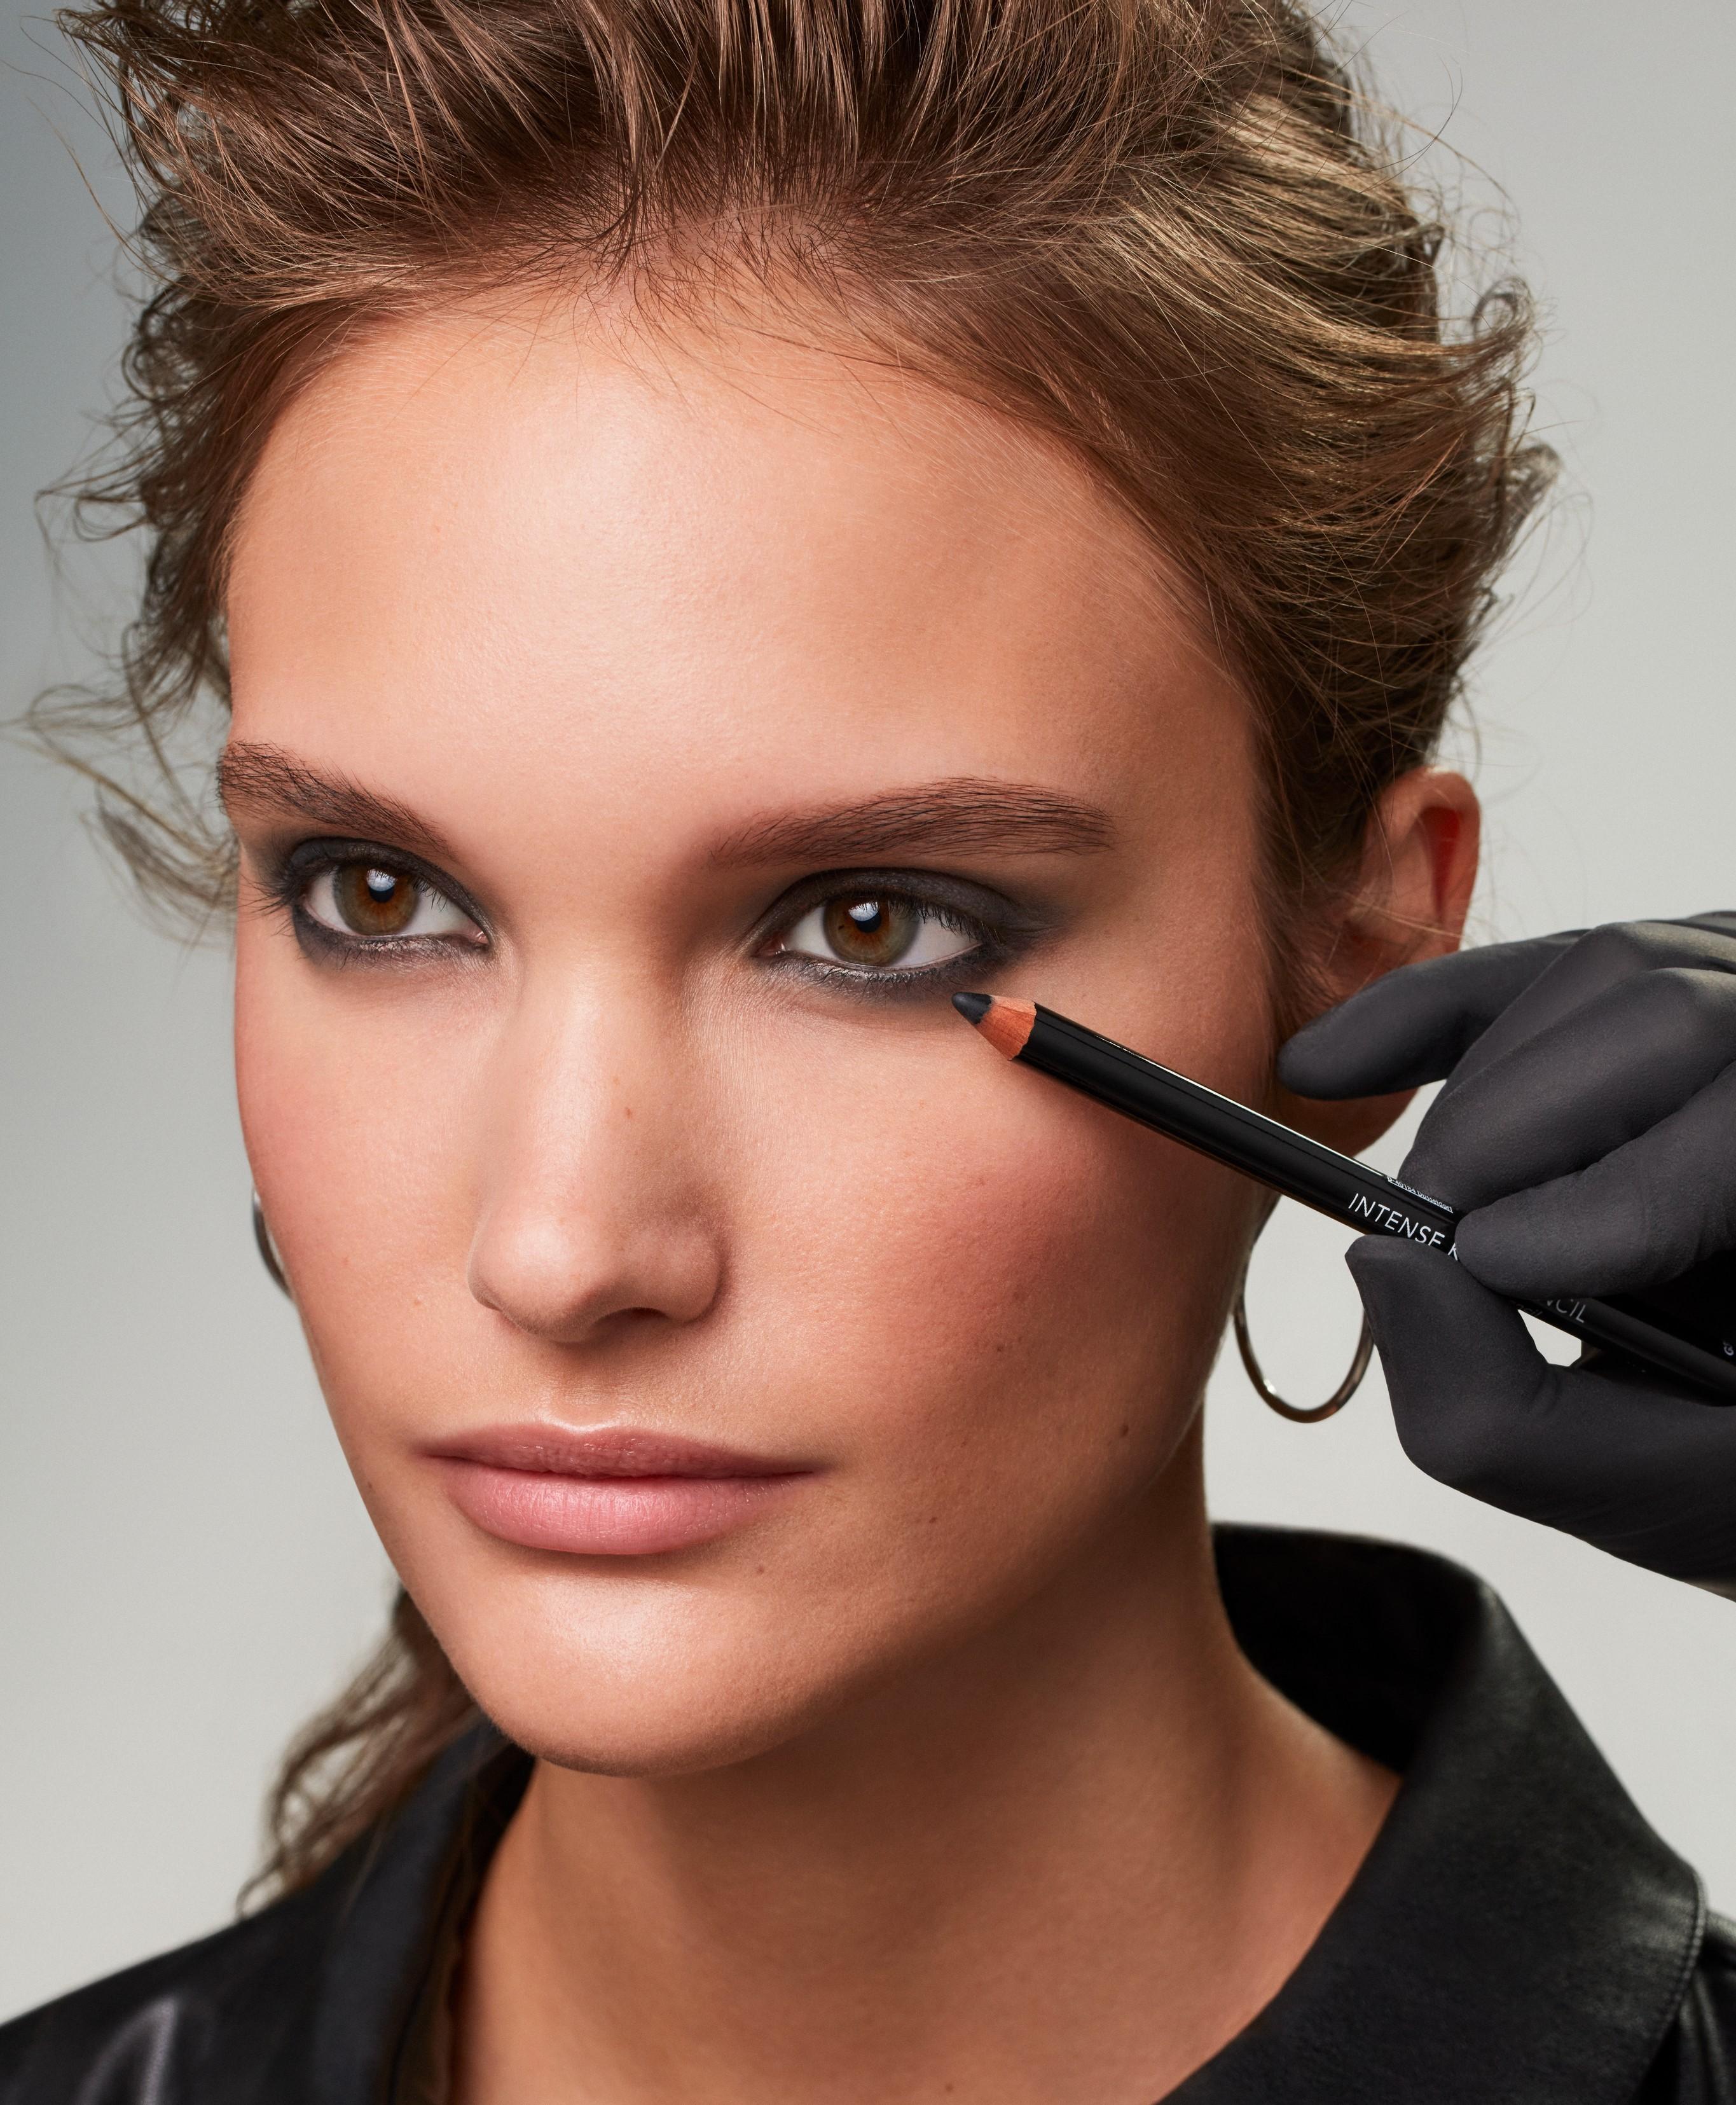 Makeup-application-2-smokey-eyes-062023-Web-Rendition